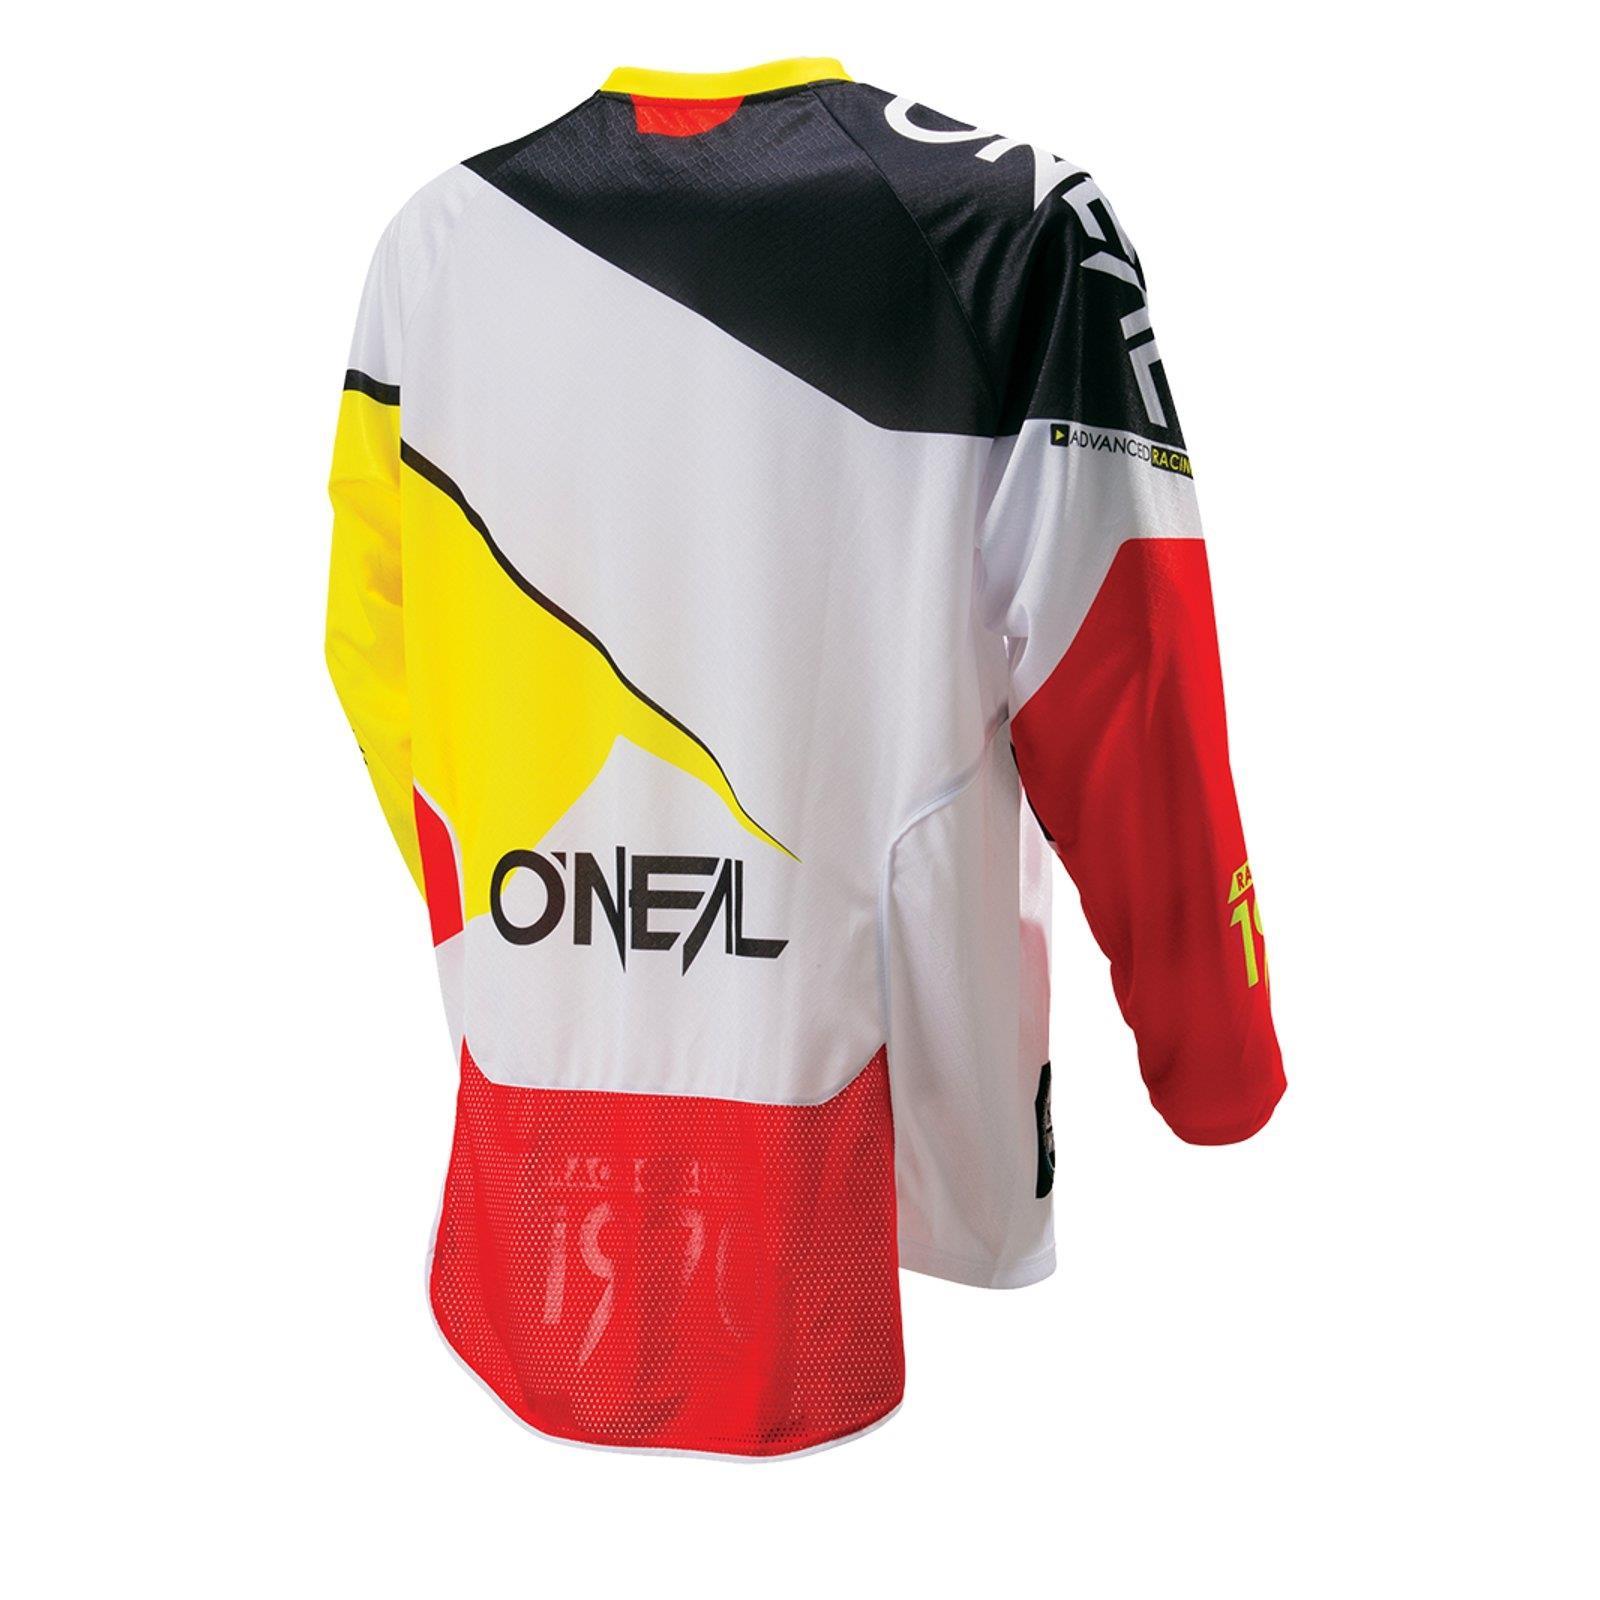 ONeal Hardwear MX Jersey FLOW Weiß Shirt Super Moto Cross Enduro Motorrad MTB FR